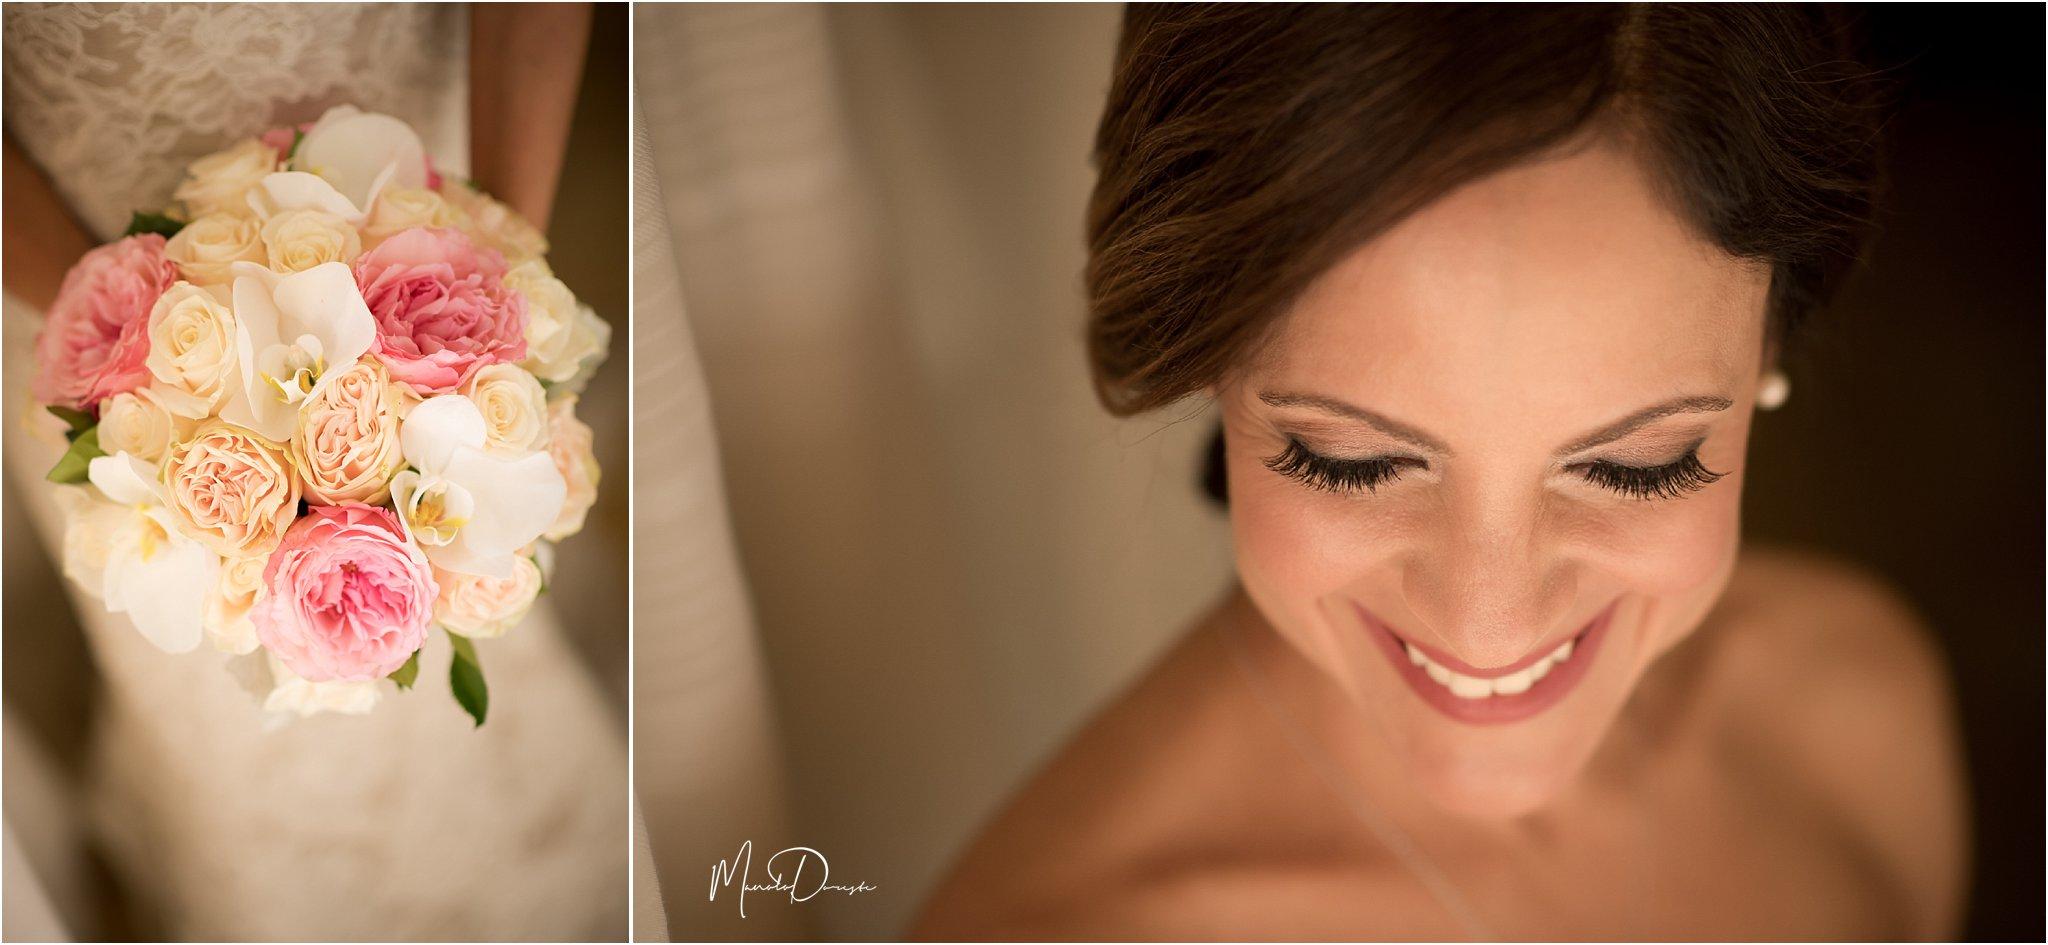 00834_ManoloDoreste_InFocusStudios_Wedding_Family_Photography_Miami_MiamiPhotographer.jpg